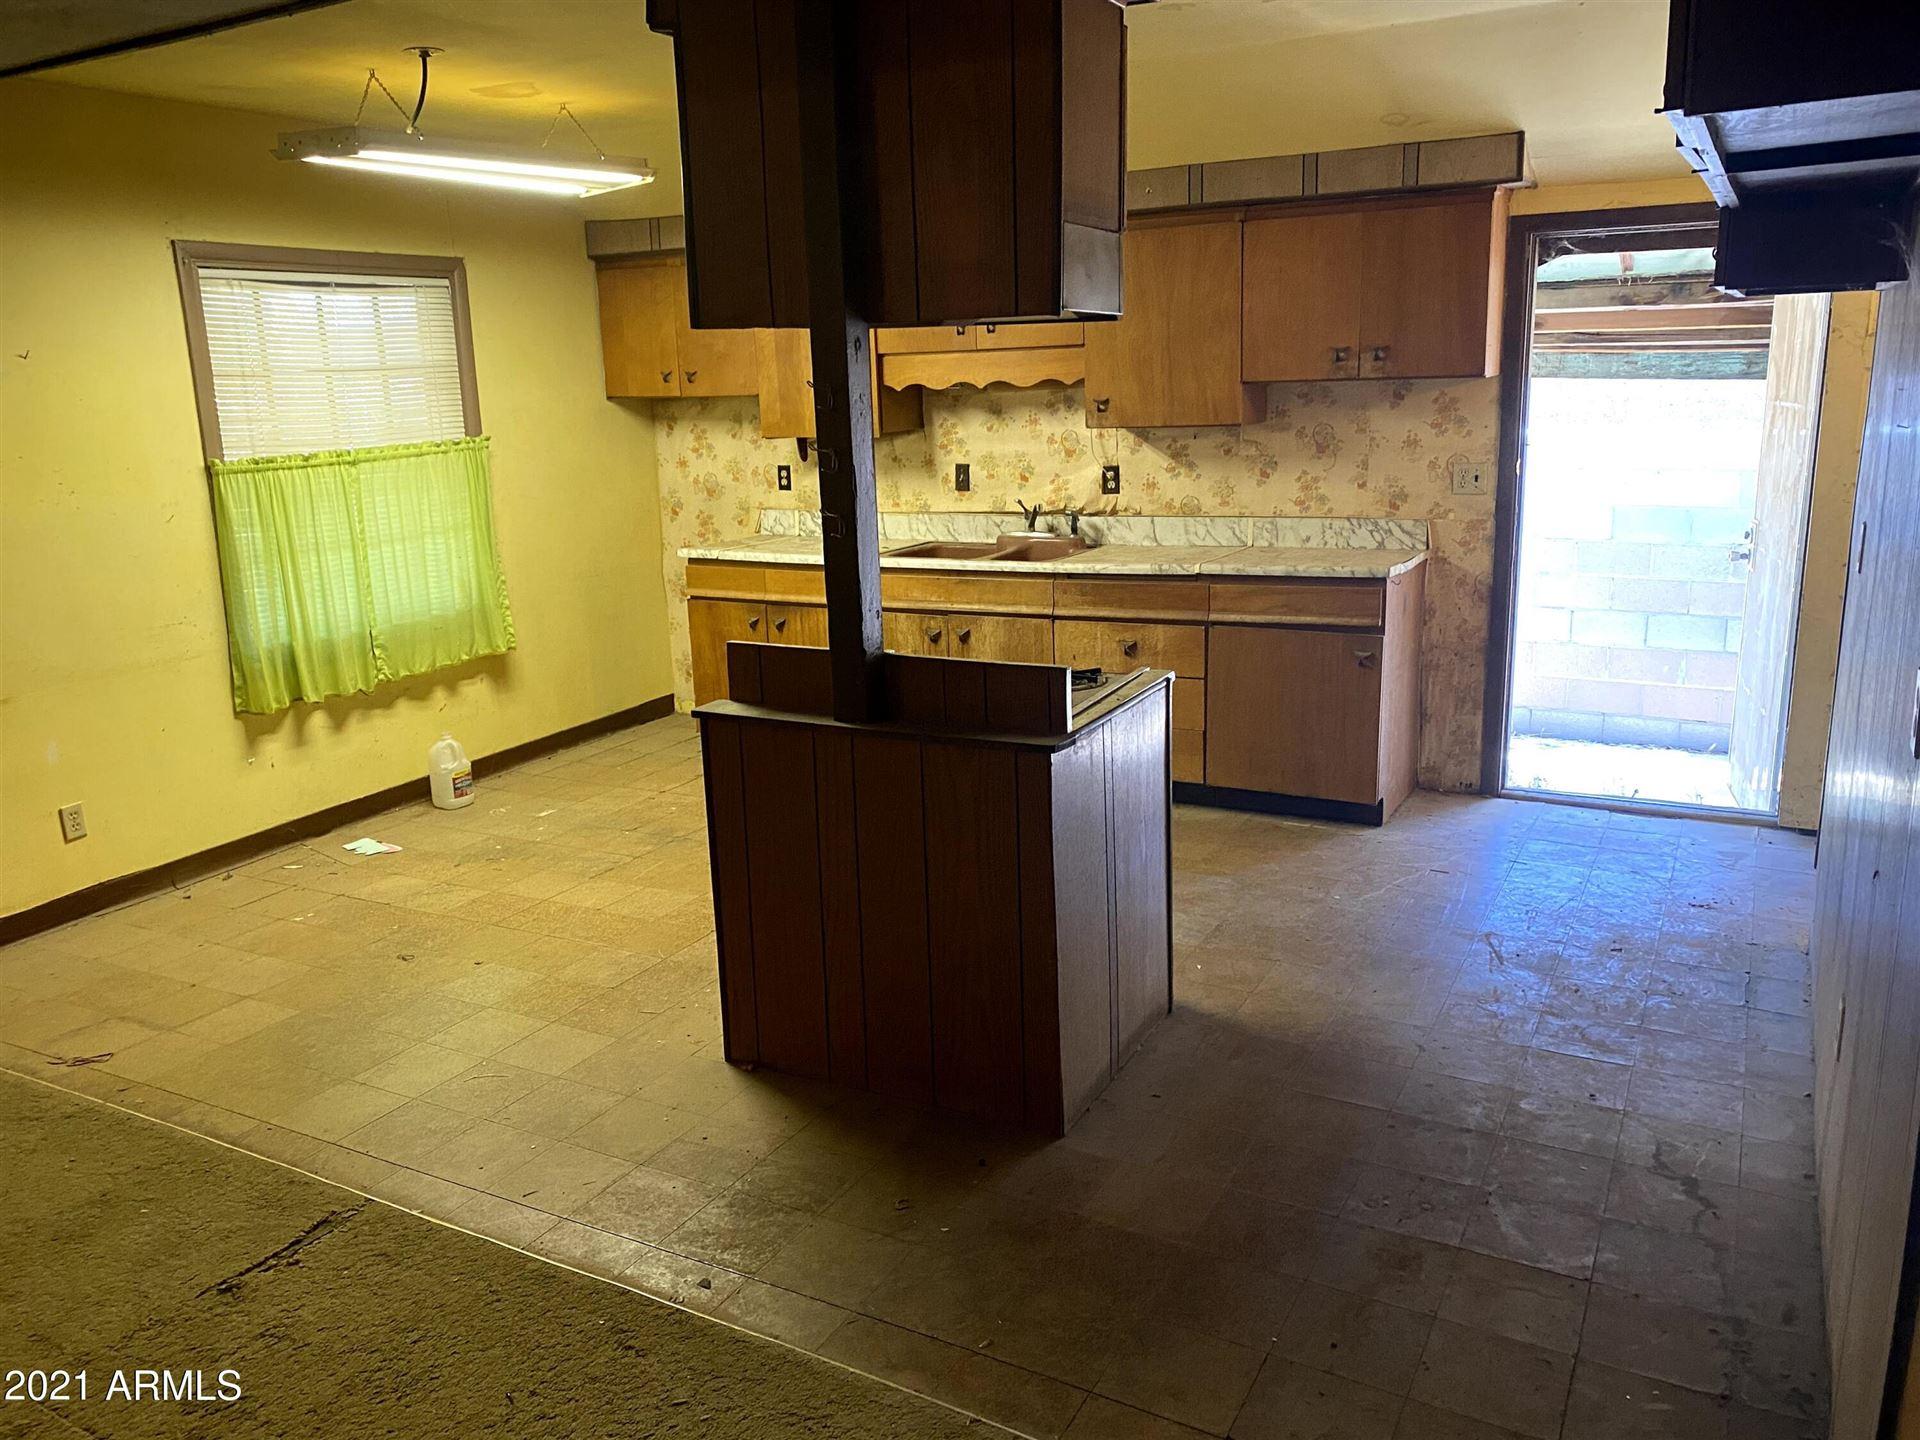 Photo of 13410 N B Street, El Mirage, AZ 85335 (MLS # 6231120)